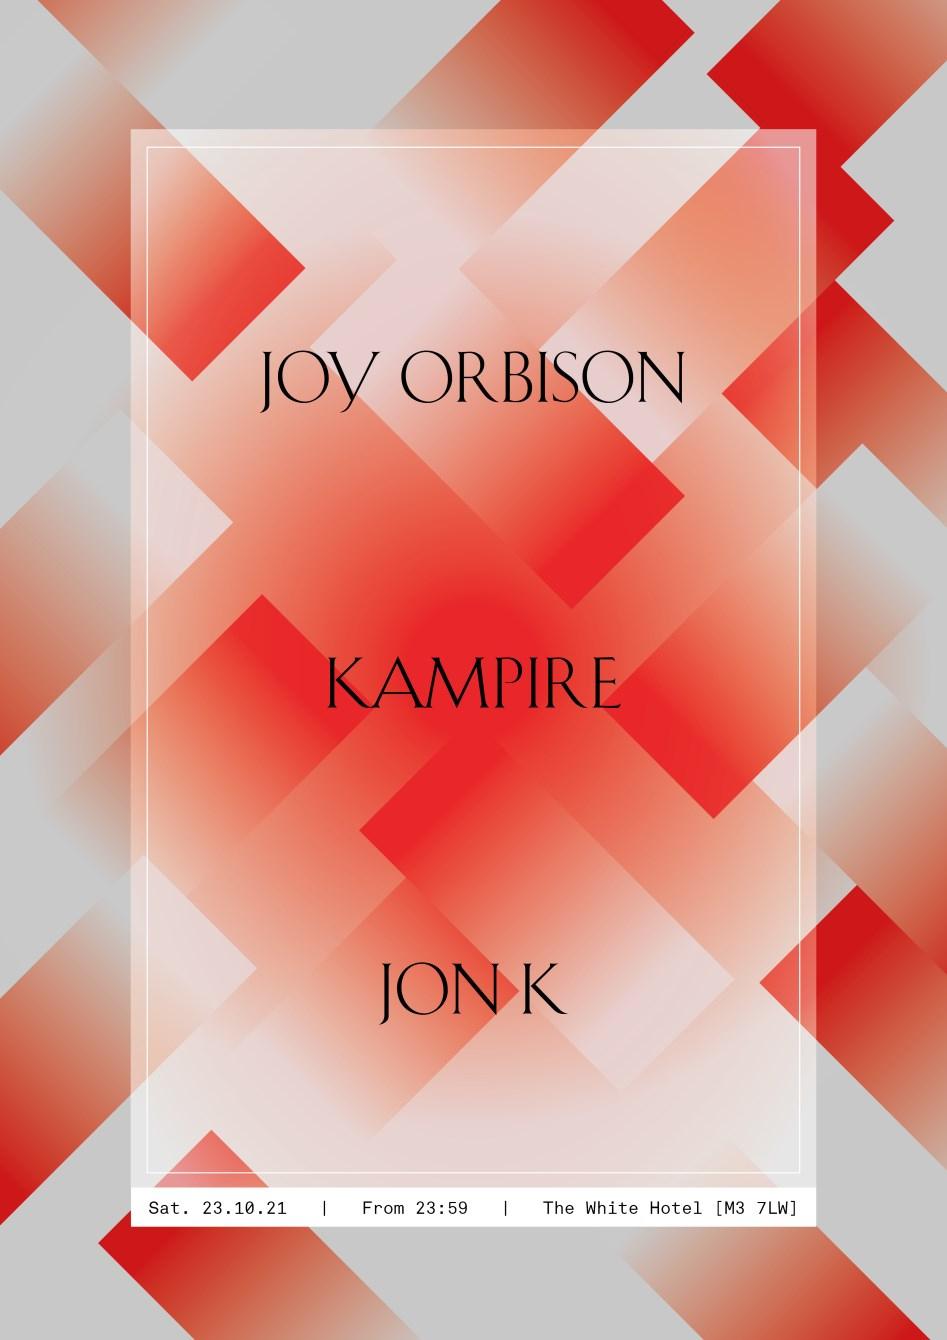 Joy Orbison / Kampire / Jon K - Flyer front